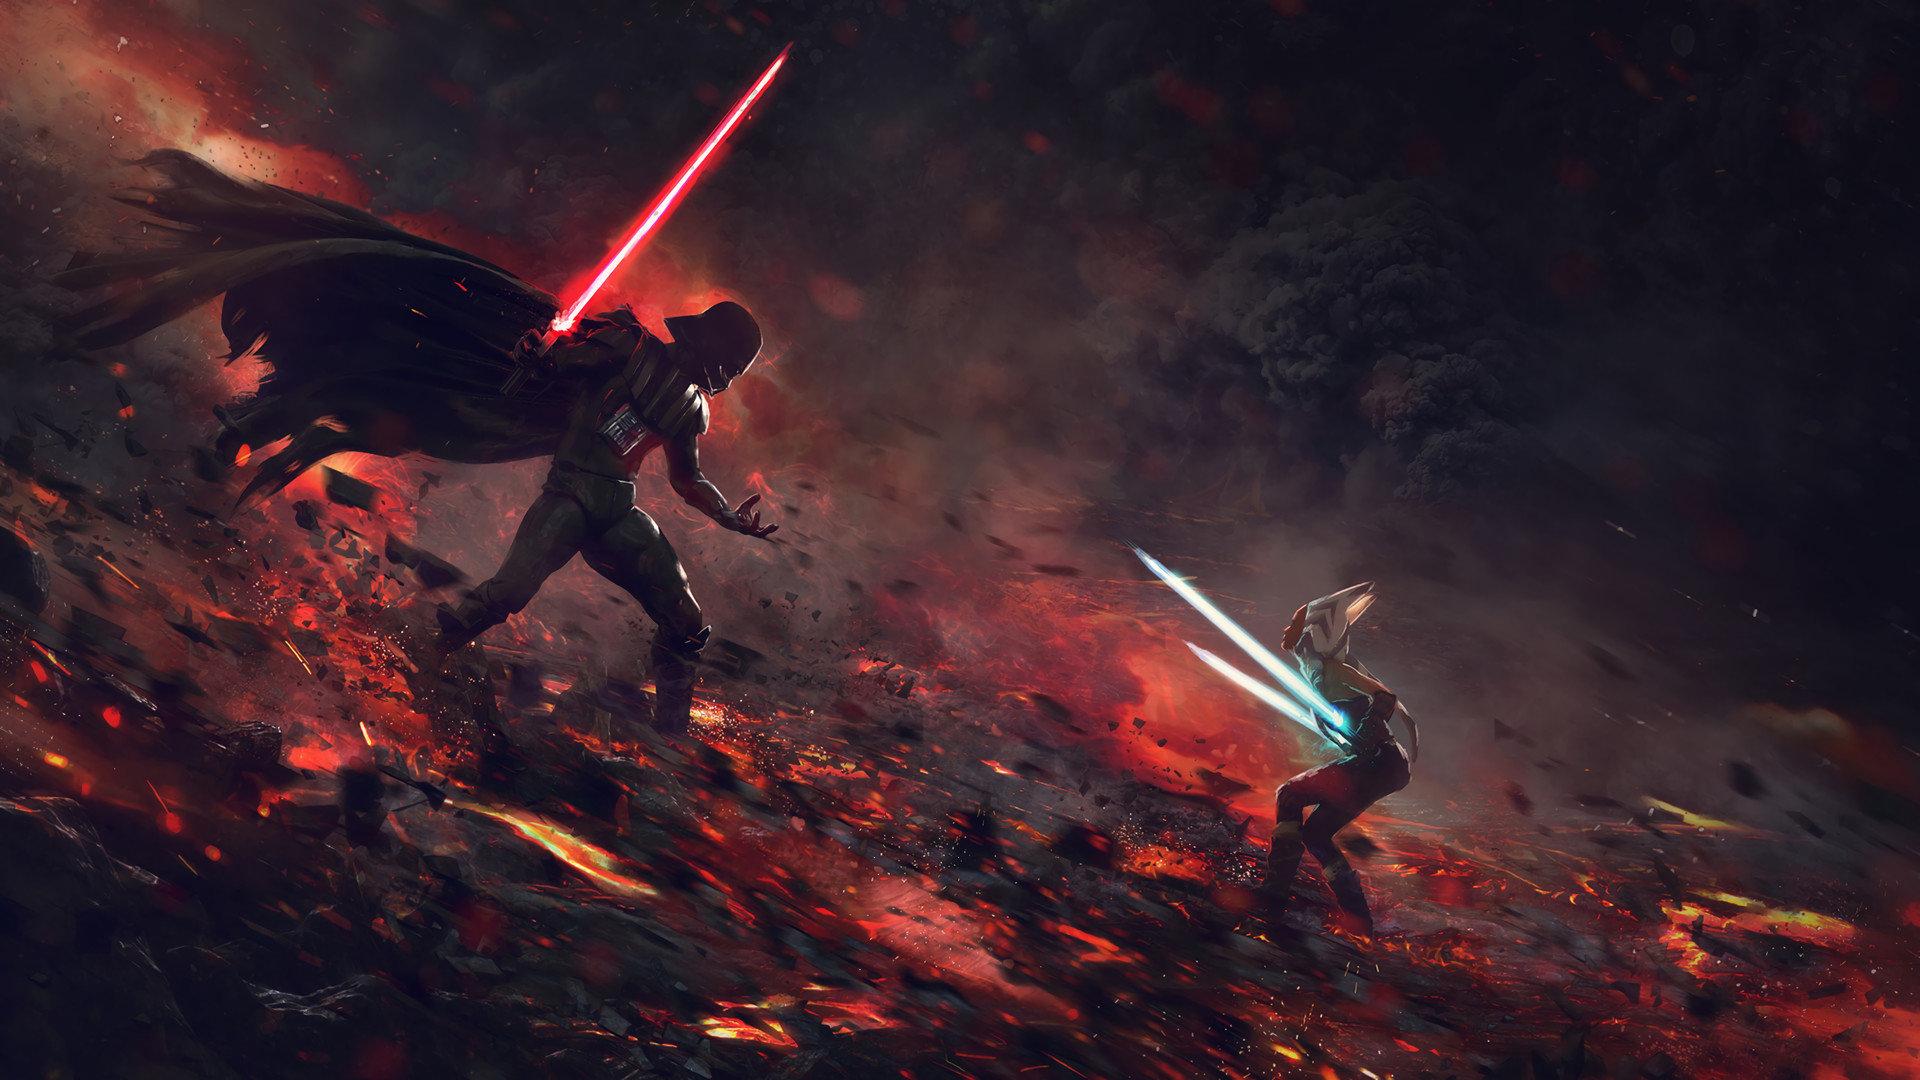 Free Download Darth Vader Wallpaper Id 459101 1080p For Desktop